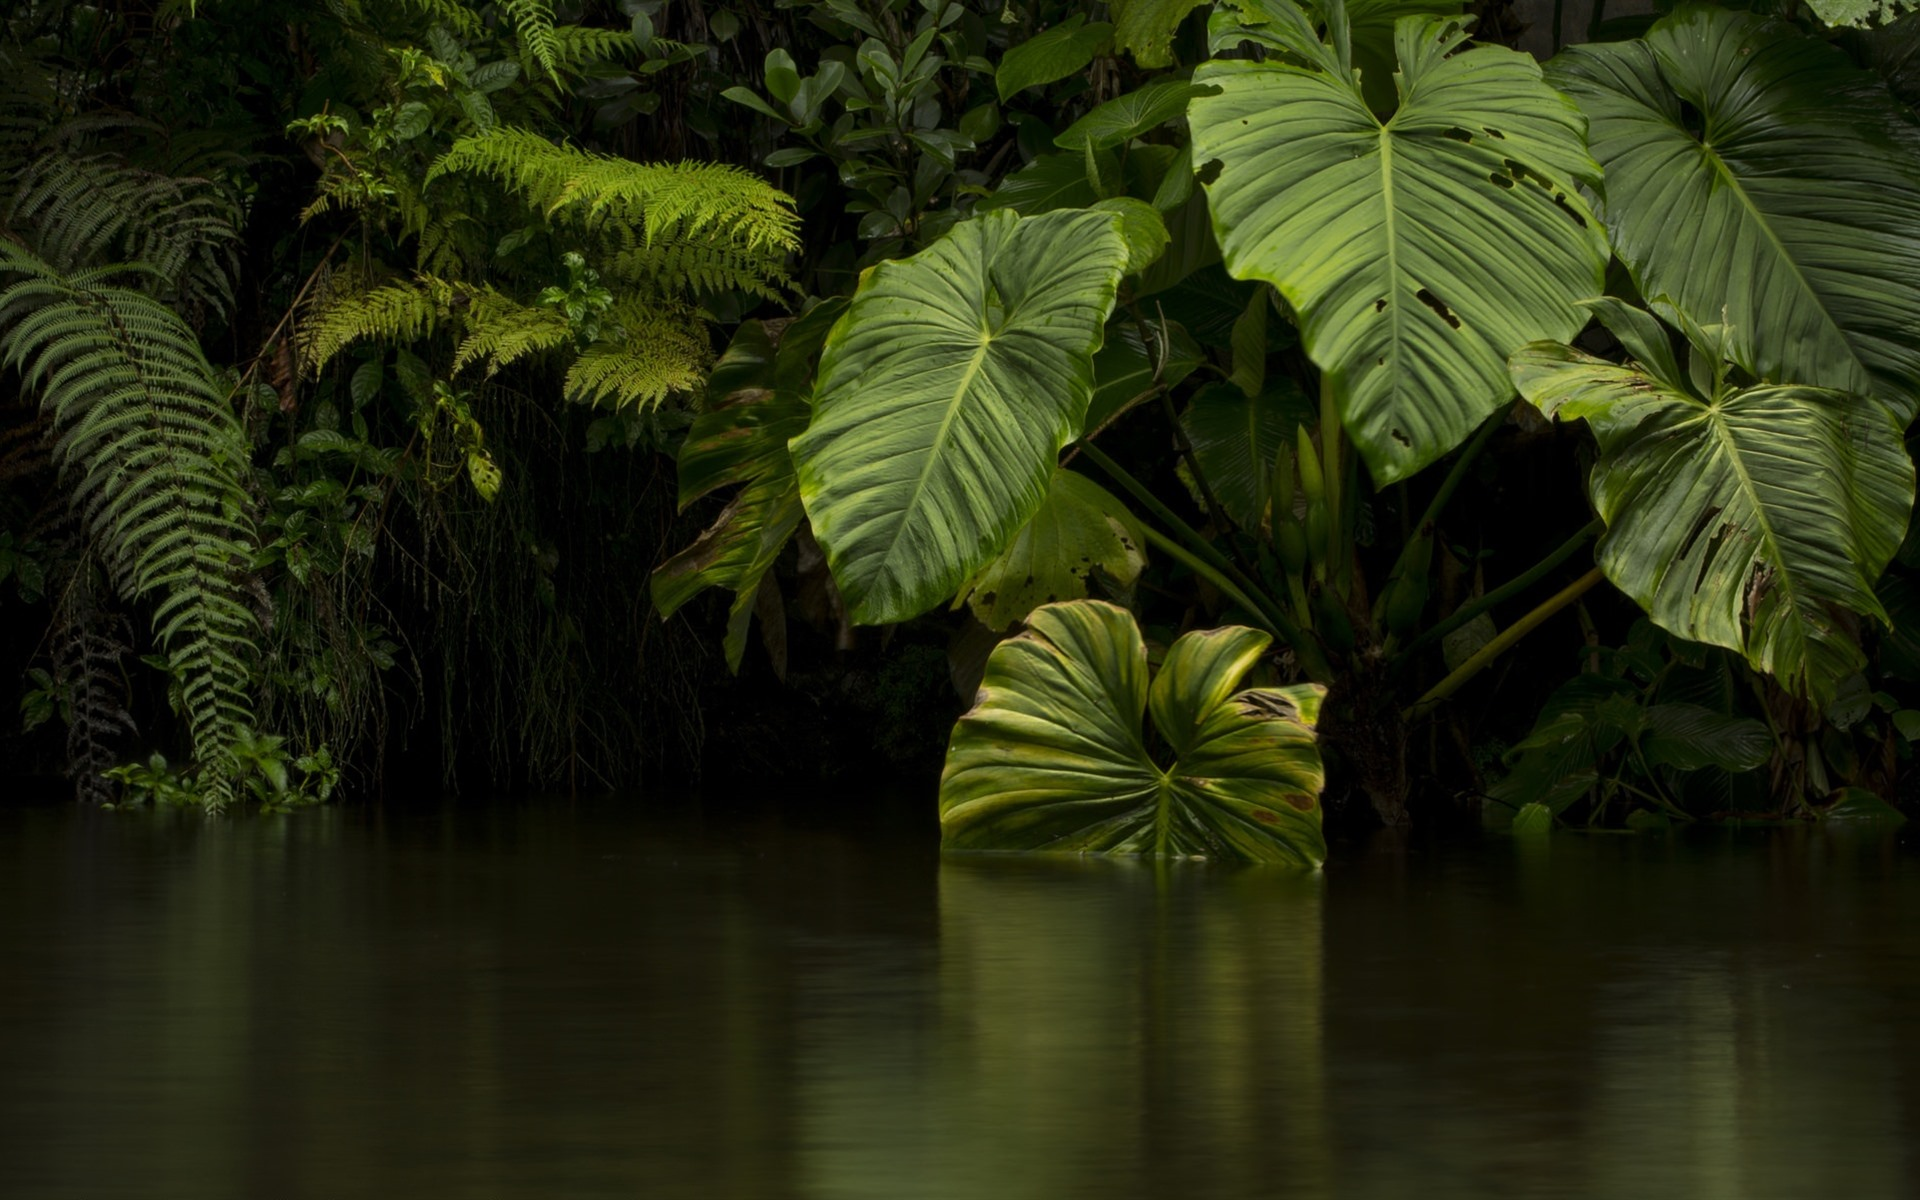 Fondo De Pantalla Selva: Fondos De Pantalla Selva, Hojas Verdes, Río, Agua